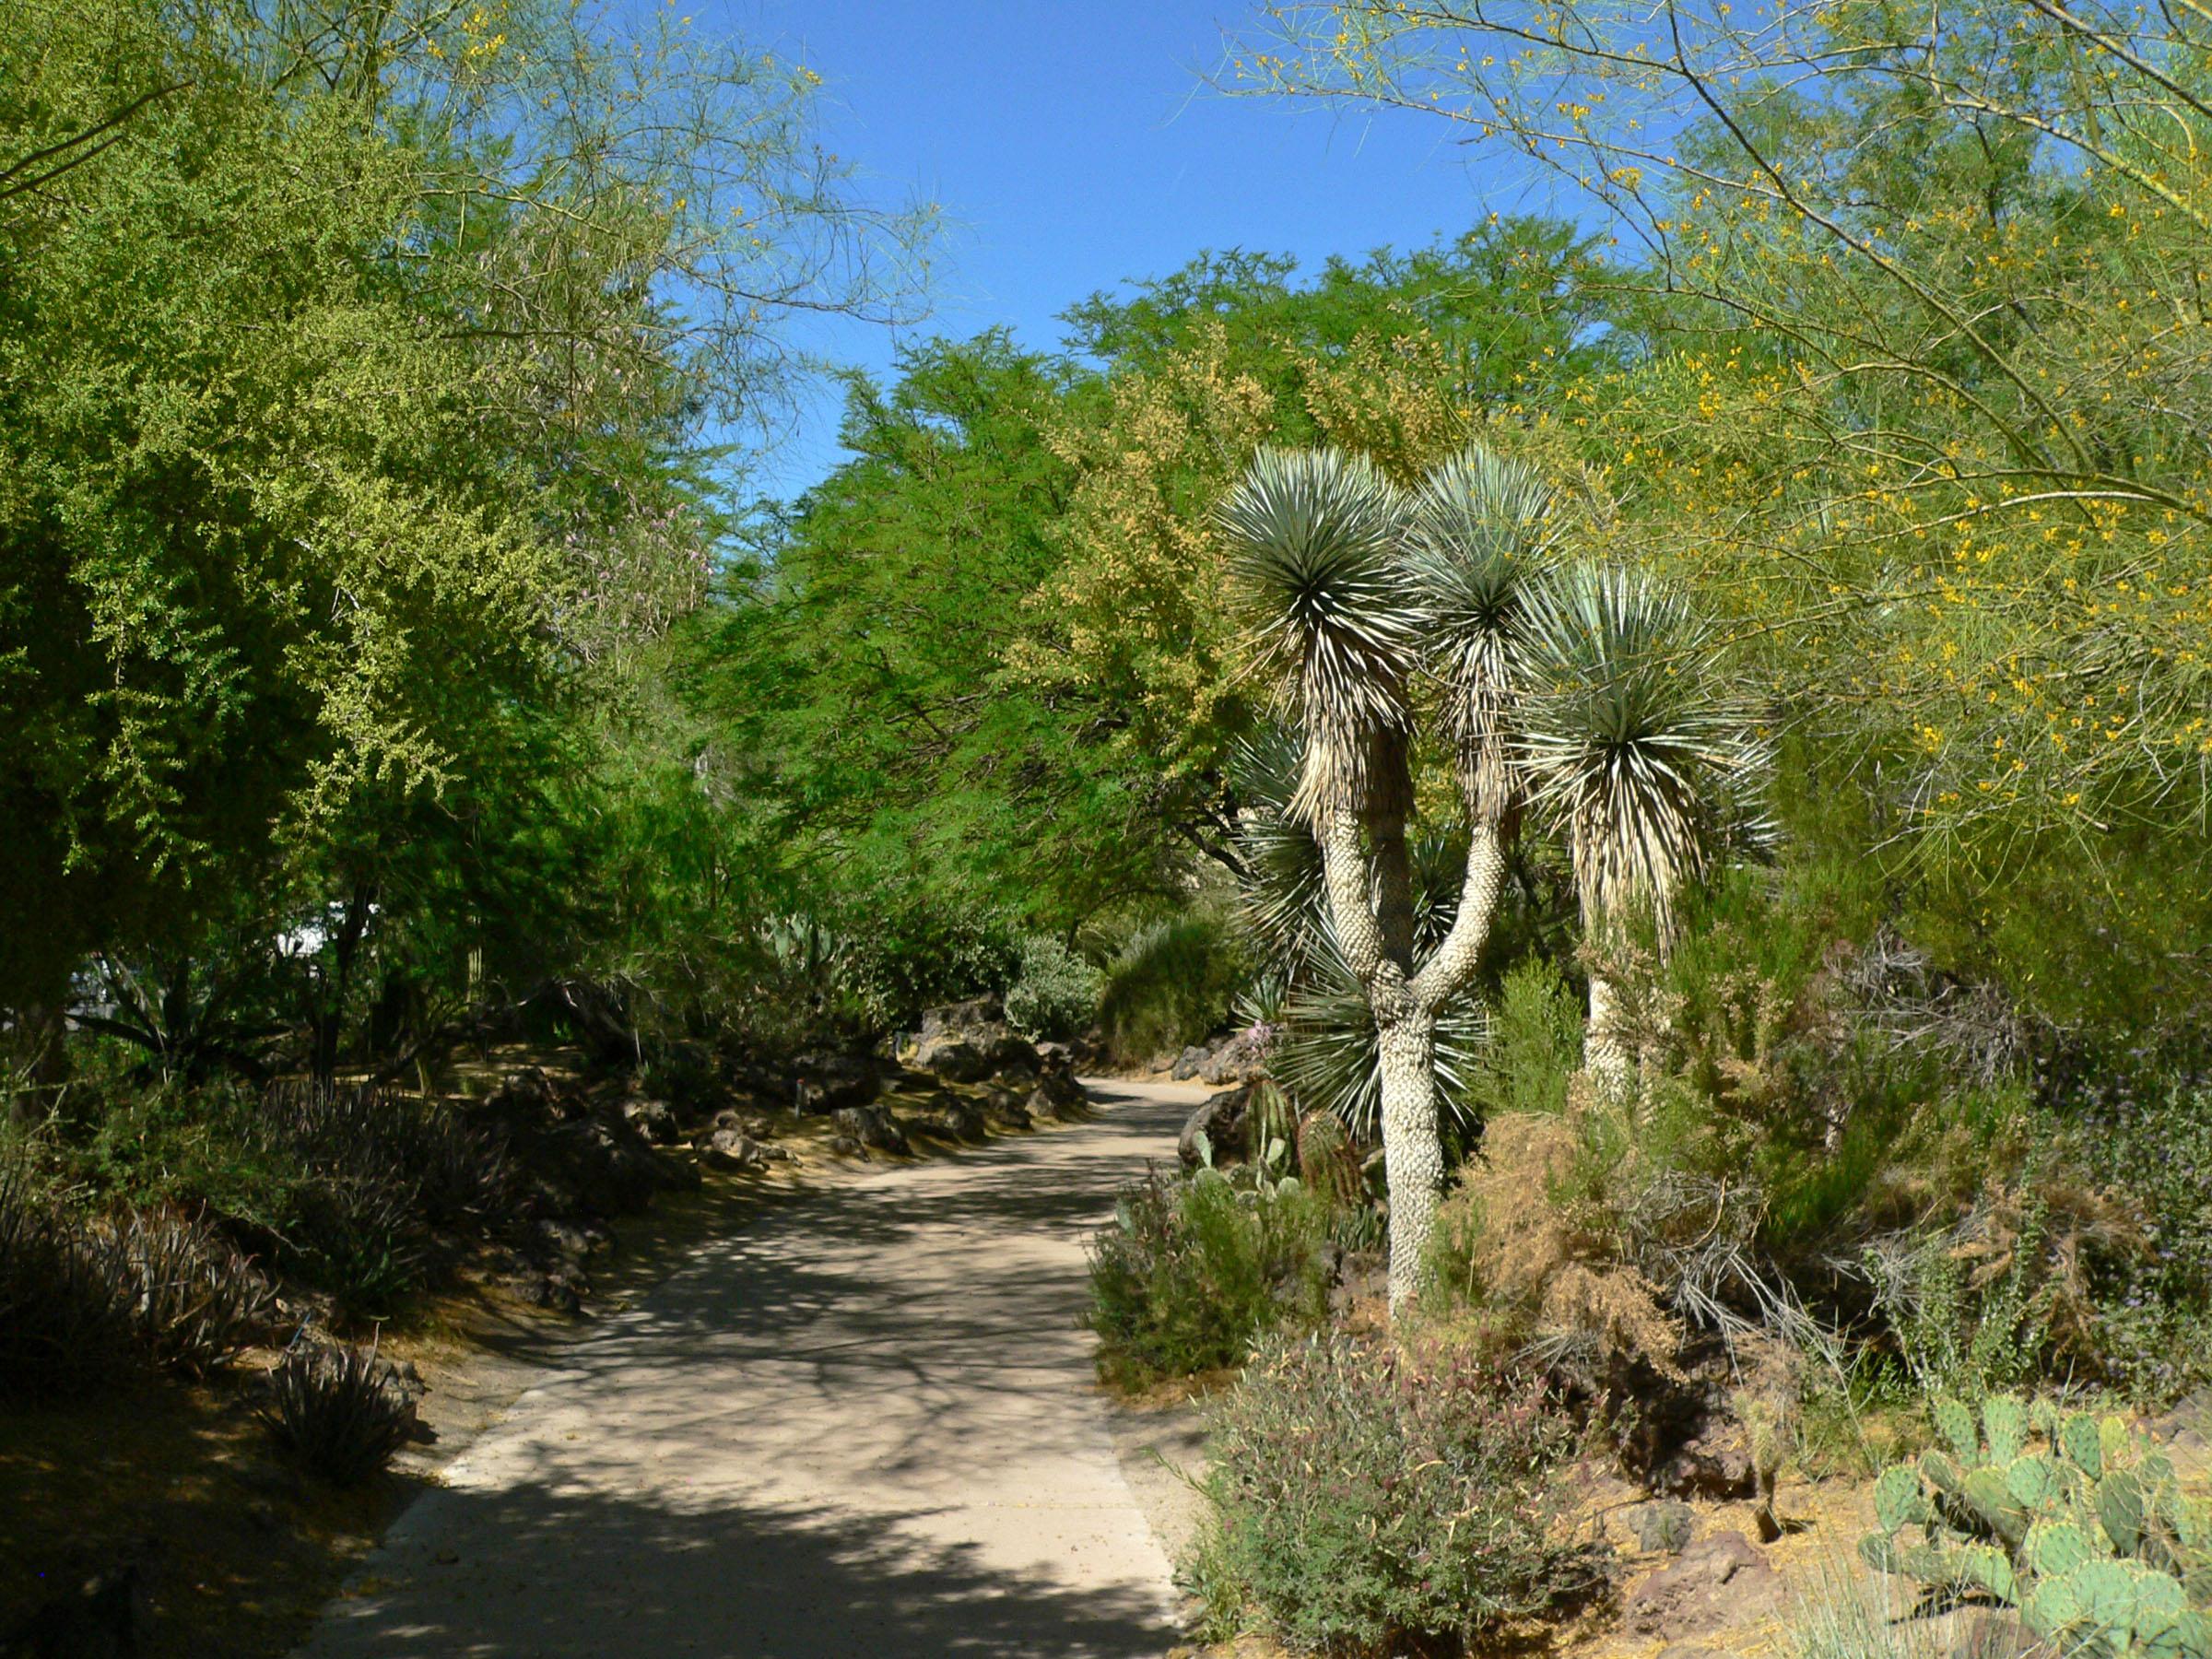 Ethel M Botanical Cactus Garden Ethel_M_Botanical_Cactus_Garden_3